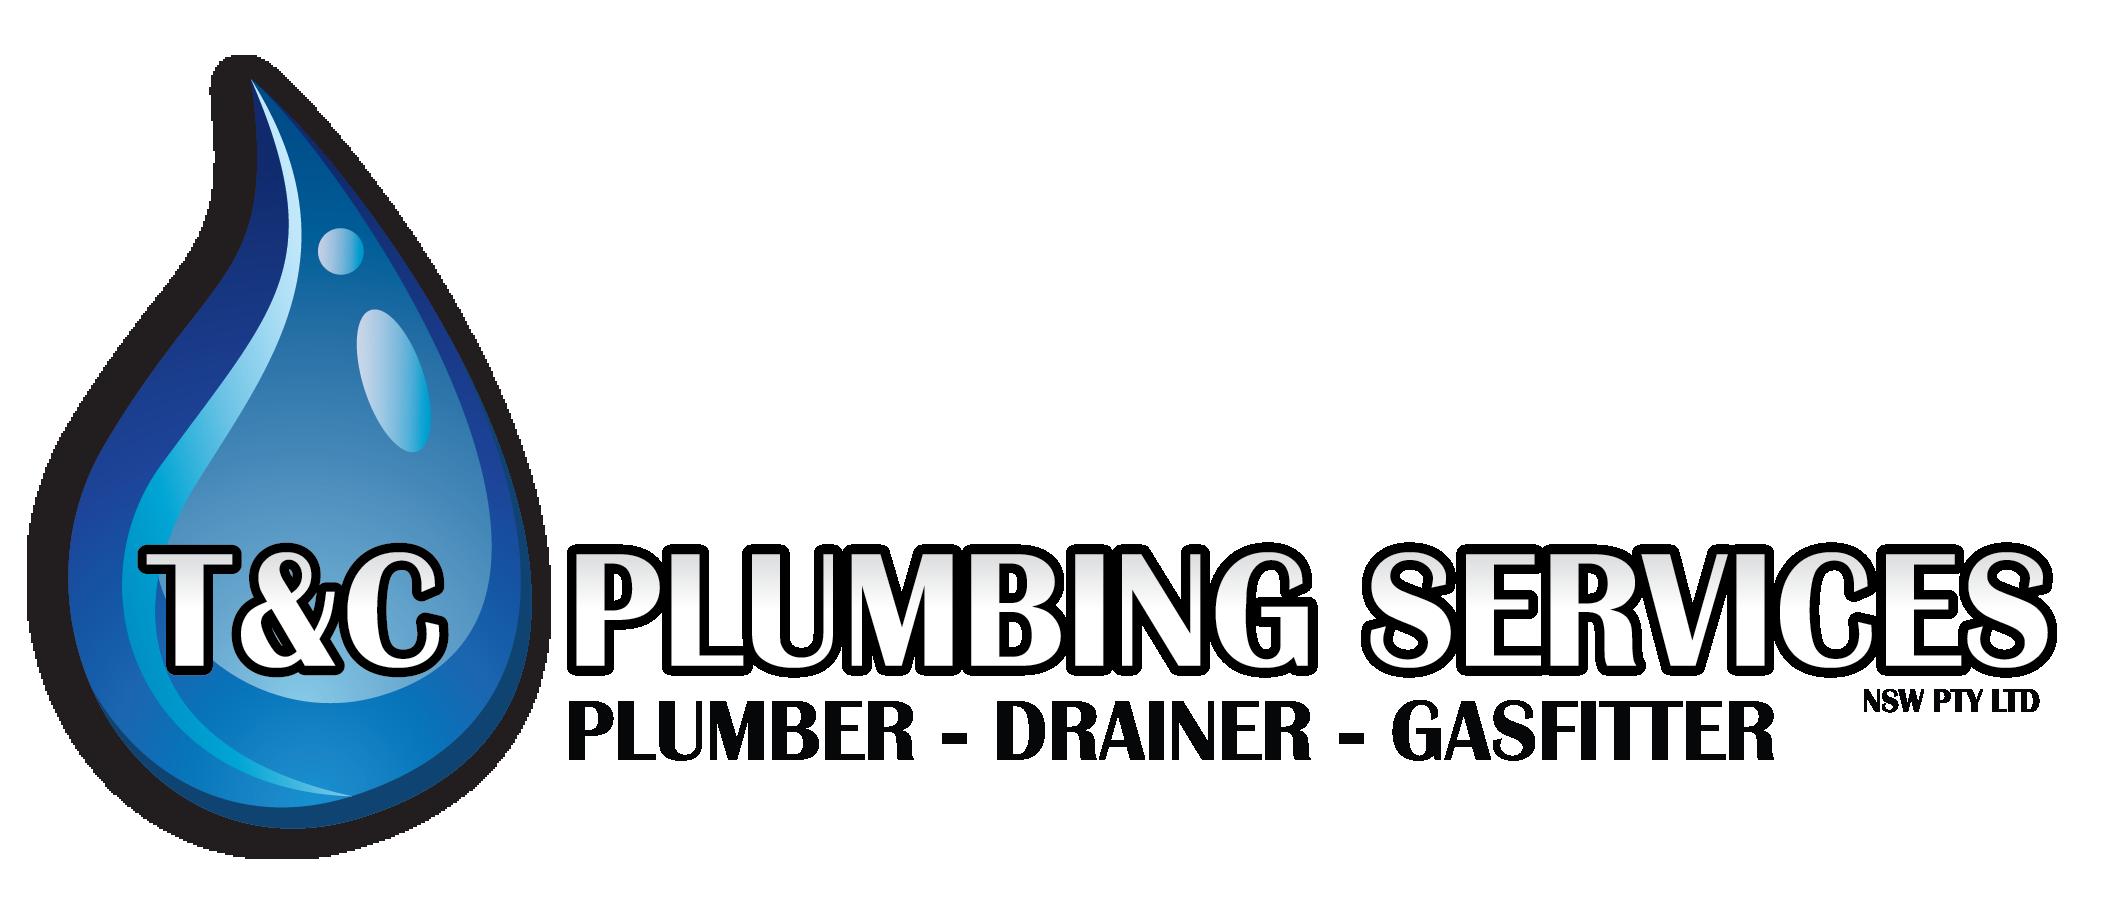 T & C Plumbing Services NSW